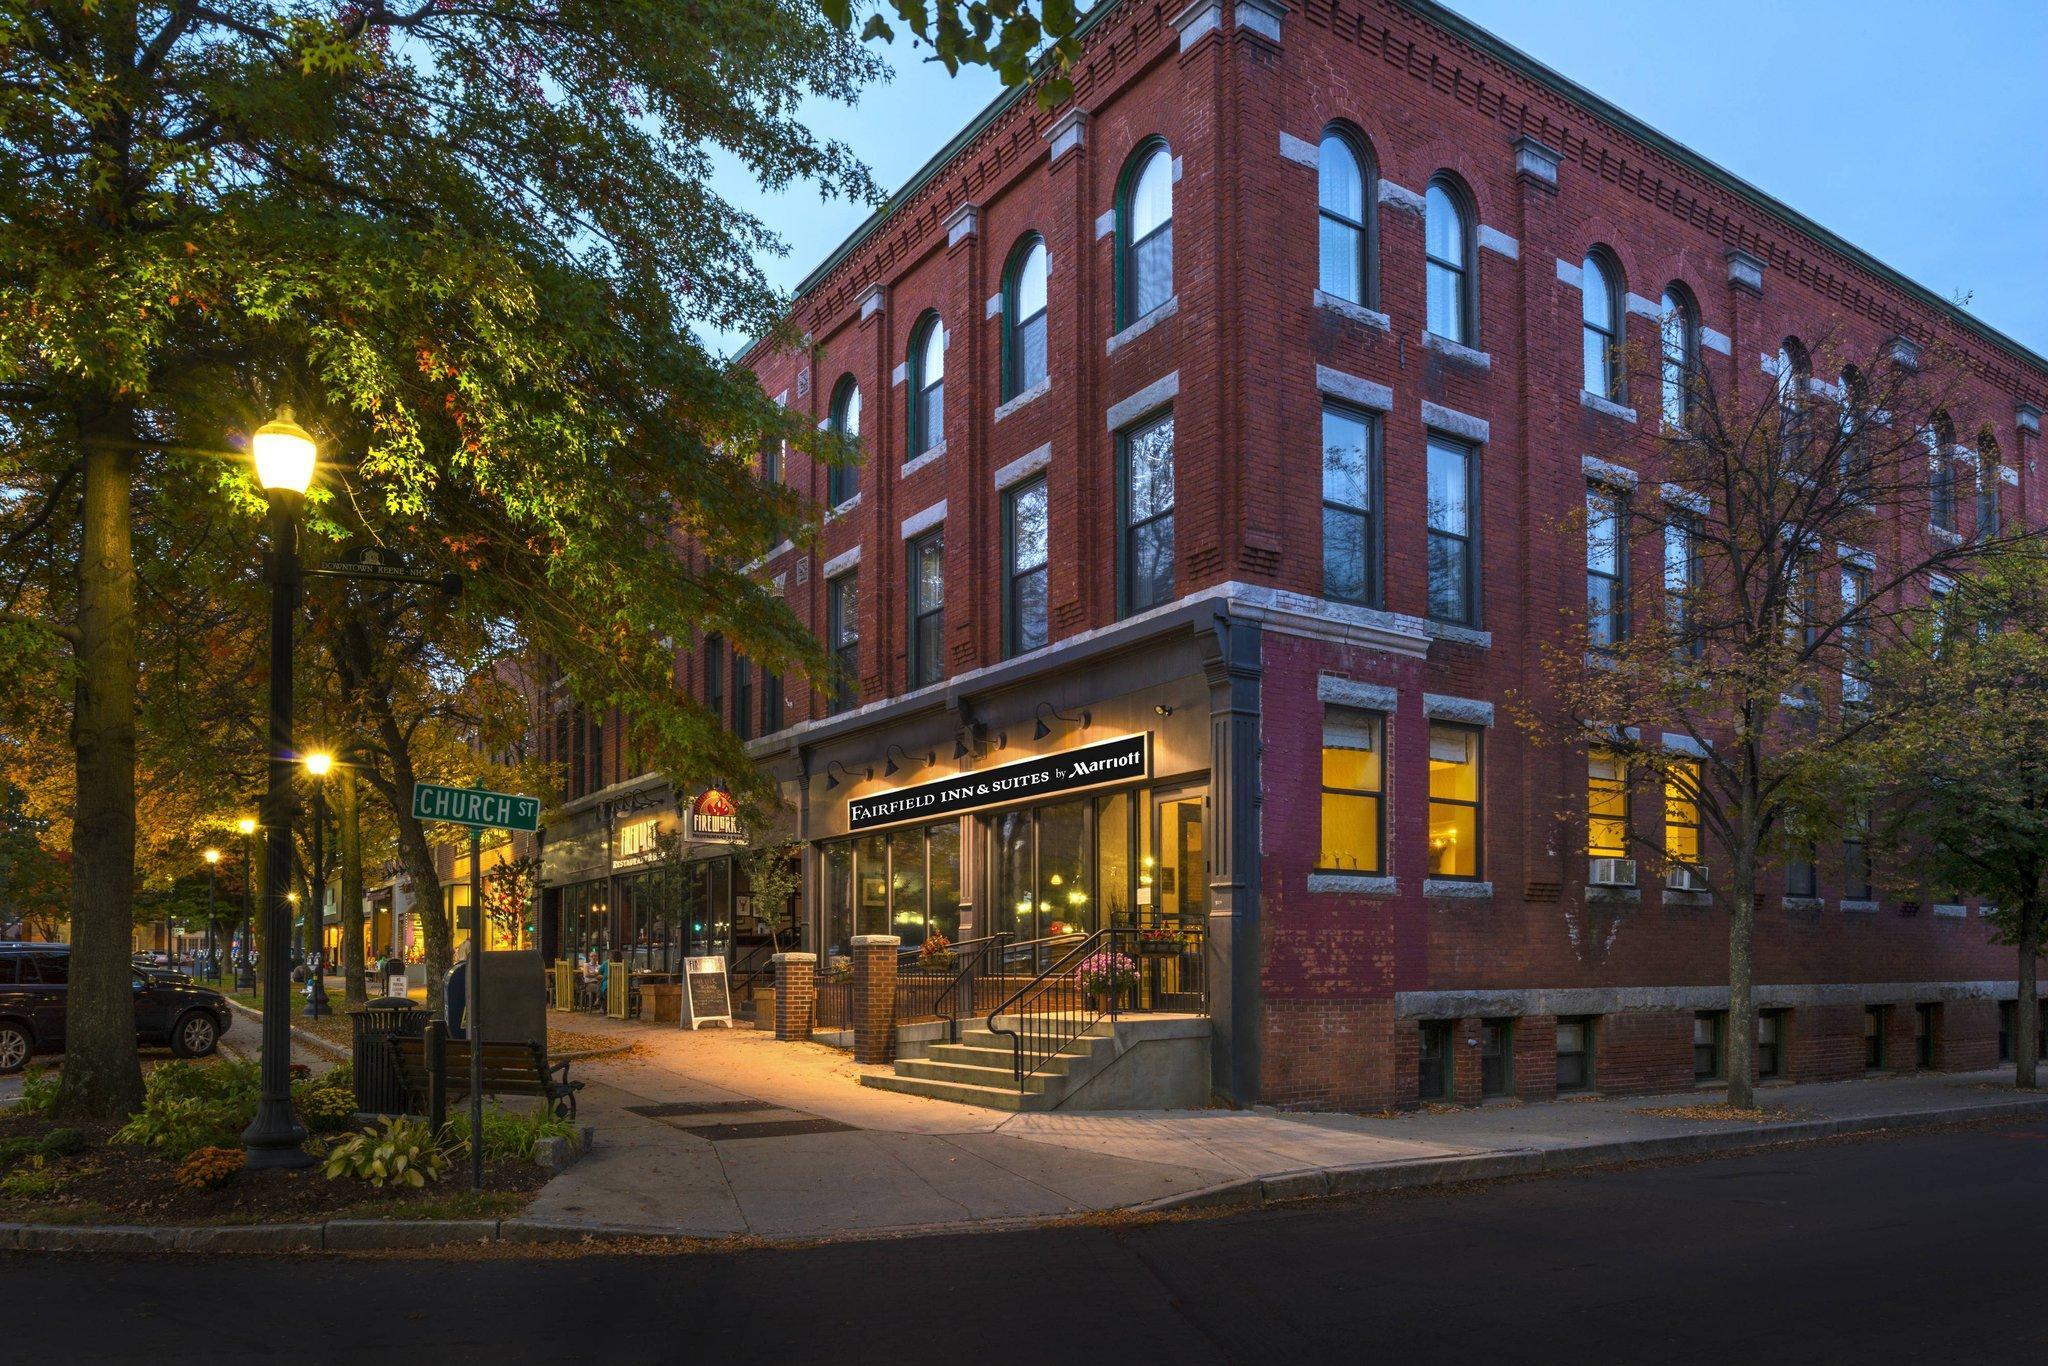 Fairfield Inn And Suites Keene Downtown